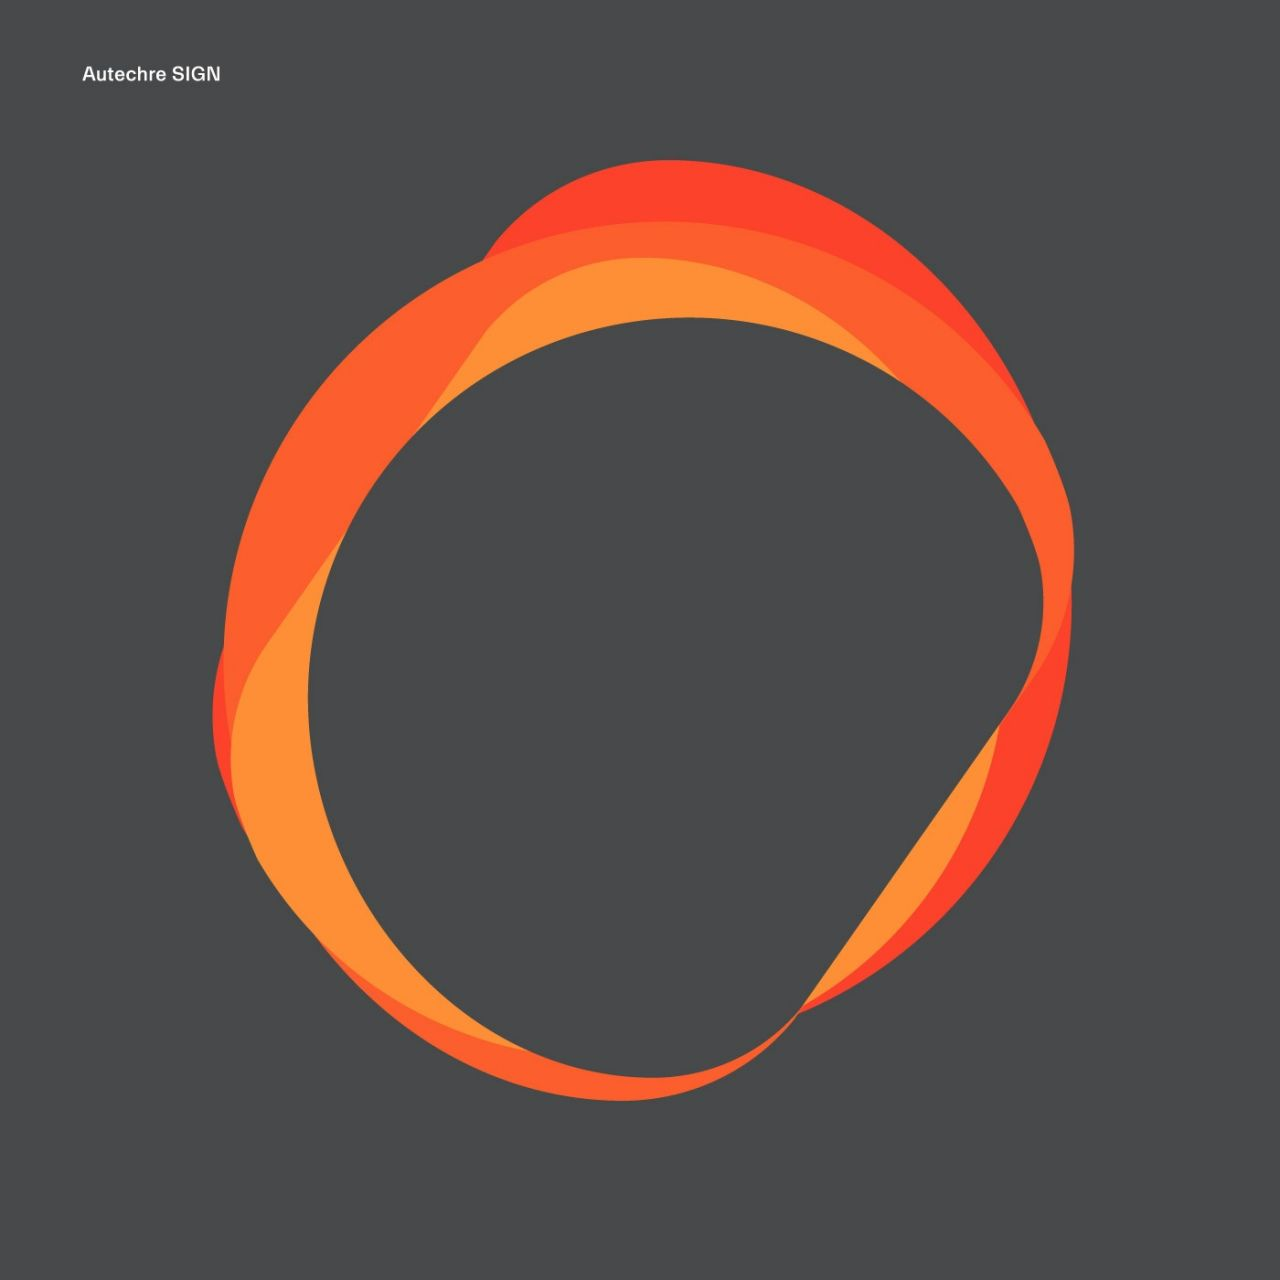 Autechre - SIGN - CD